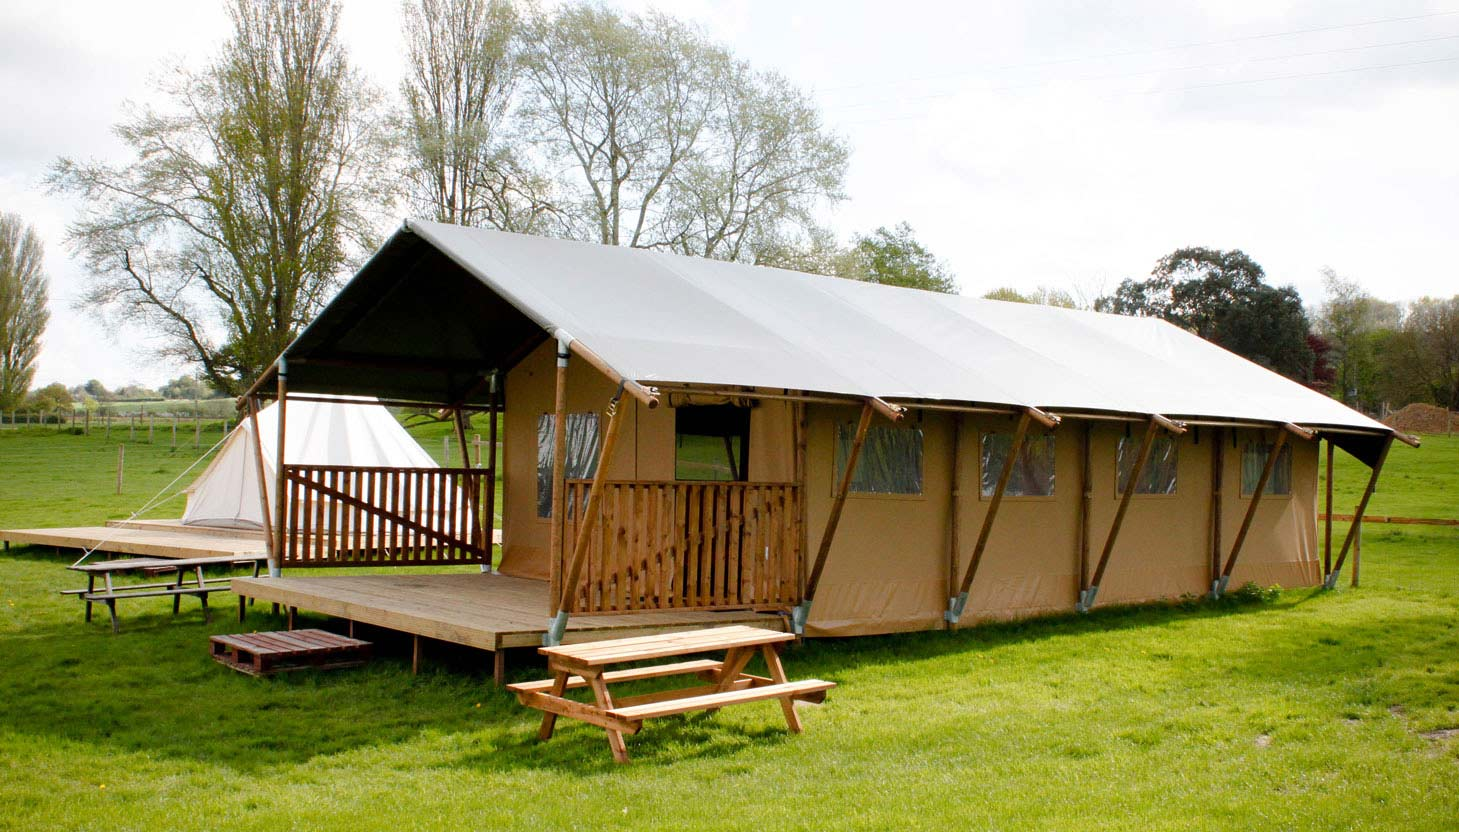 The Safari Tent